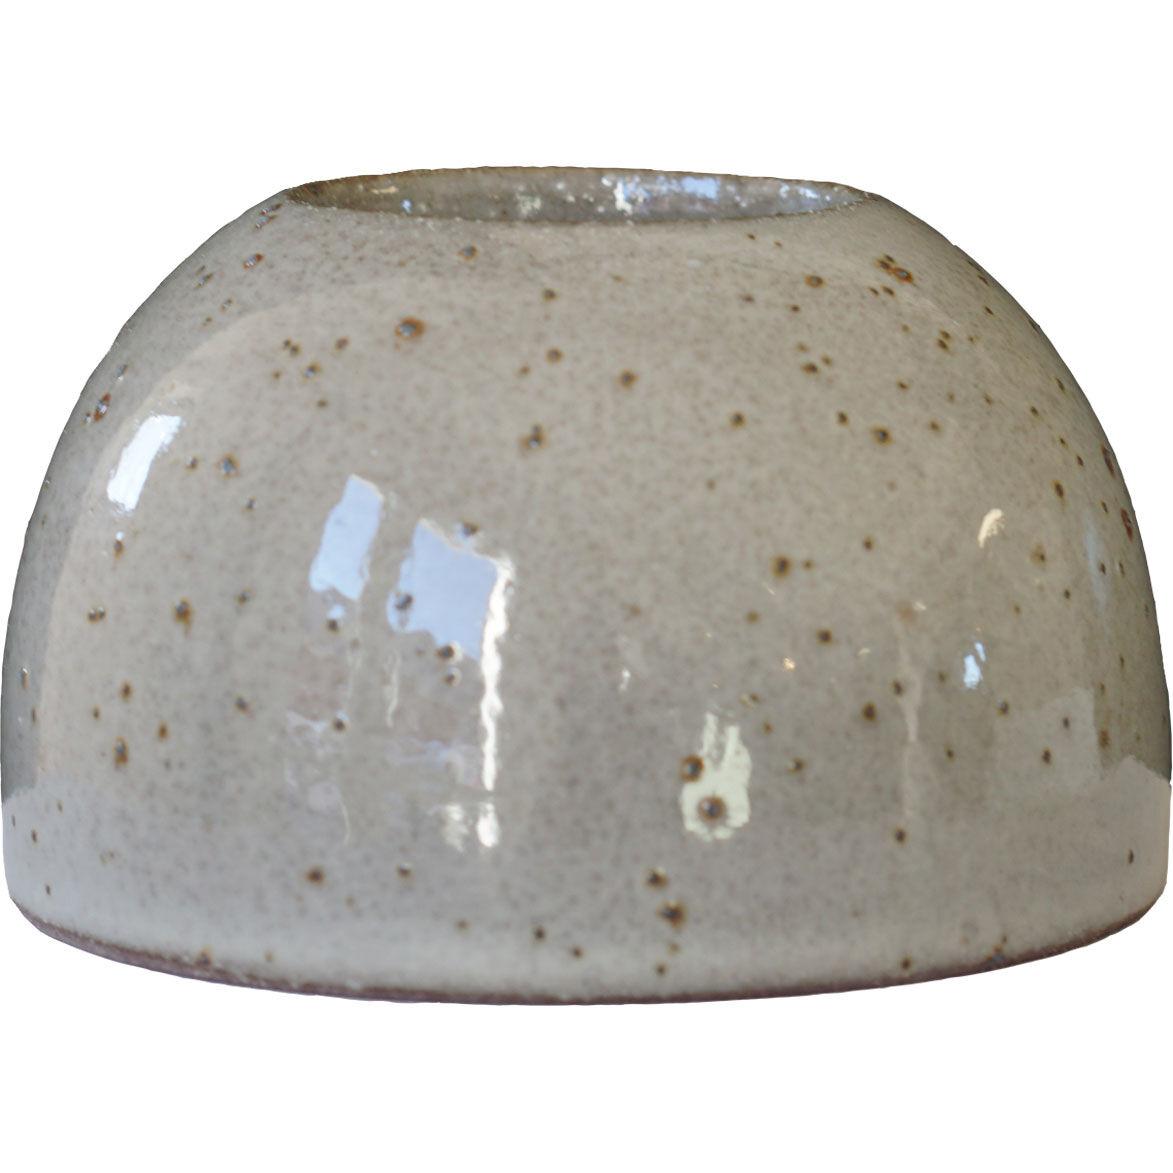 DBKD Bulb Tealight Candleholder Small, Stone